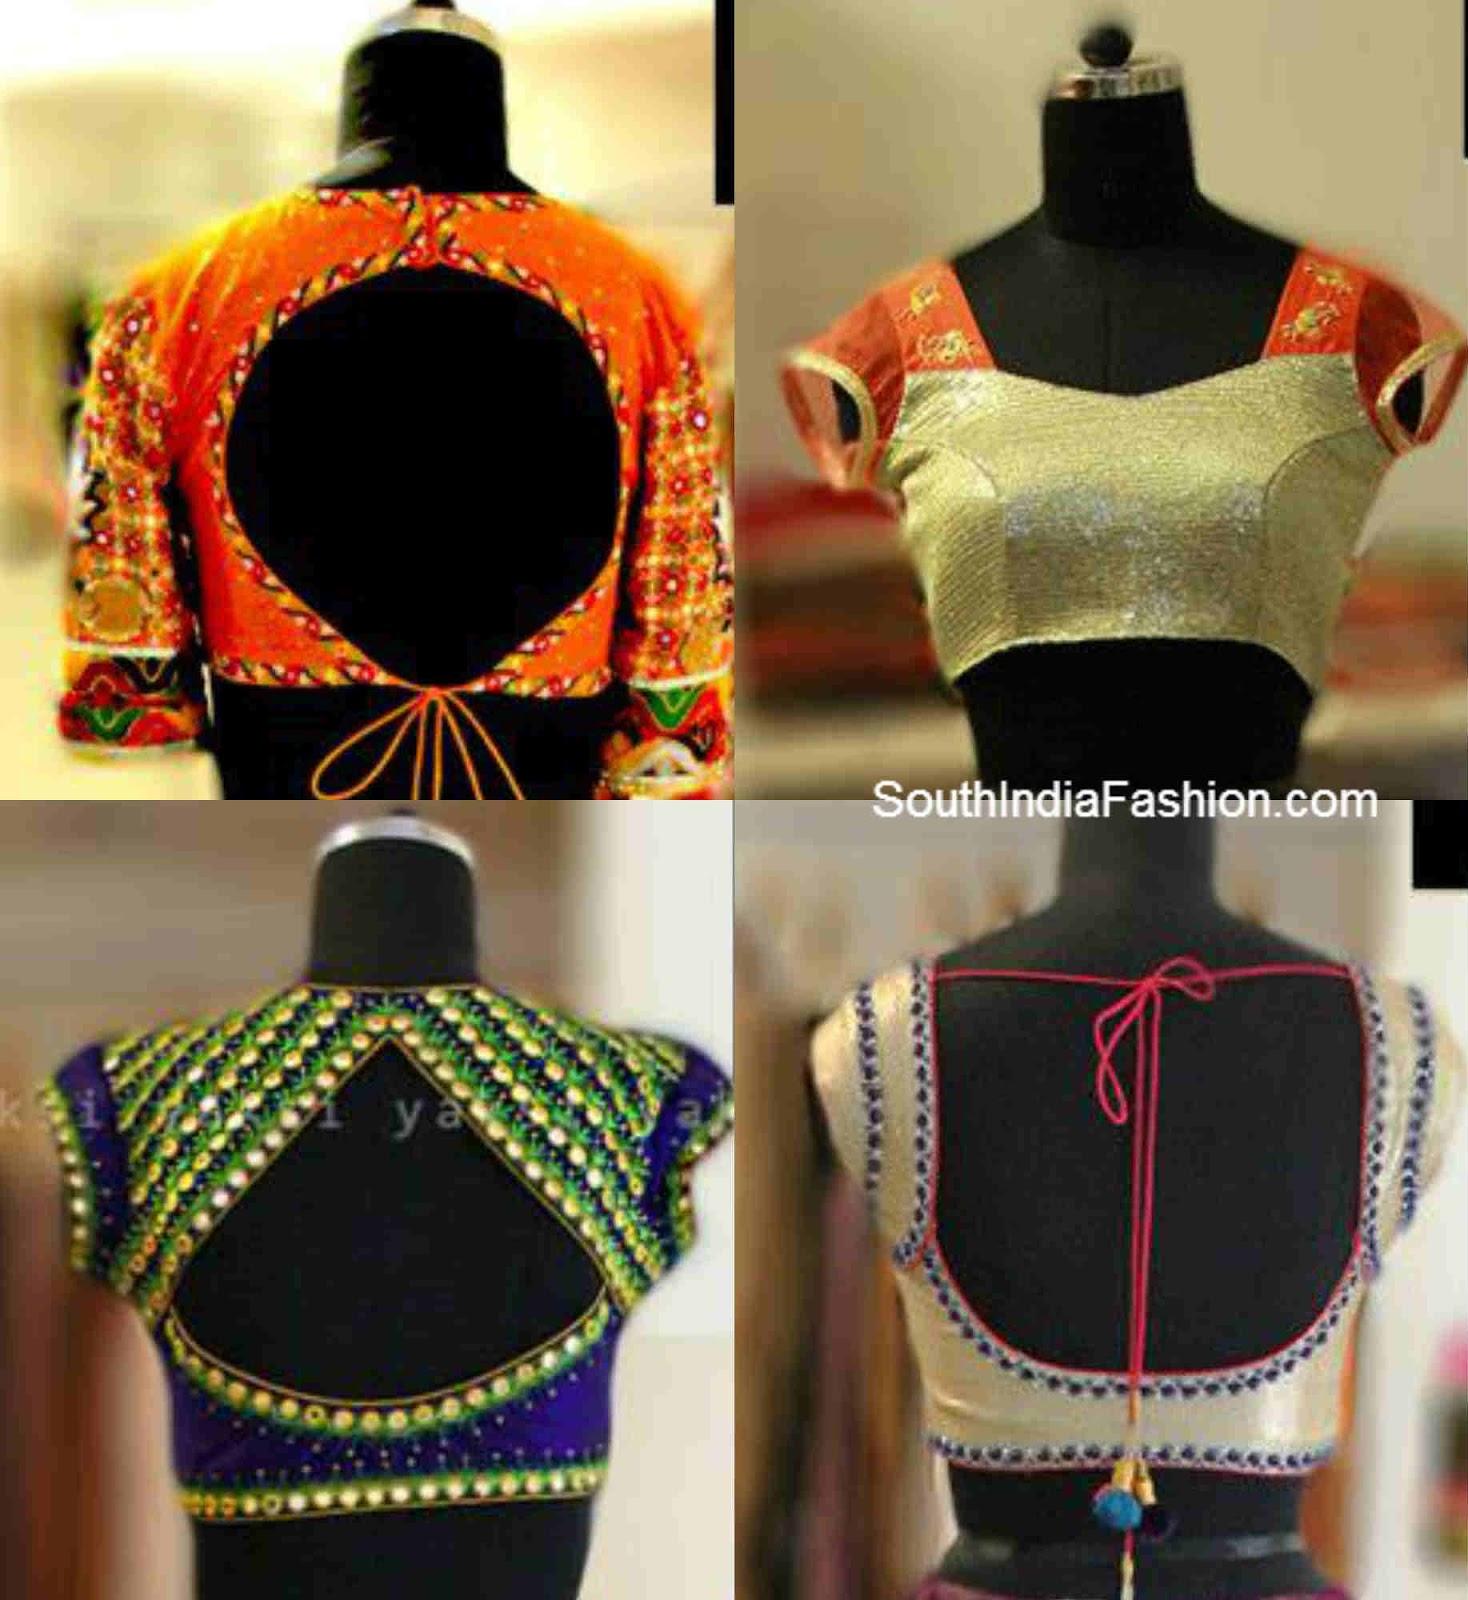 yaksi deepthi reddy fashion trends � south india fashion